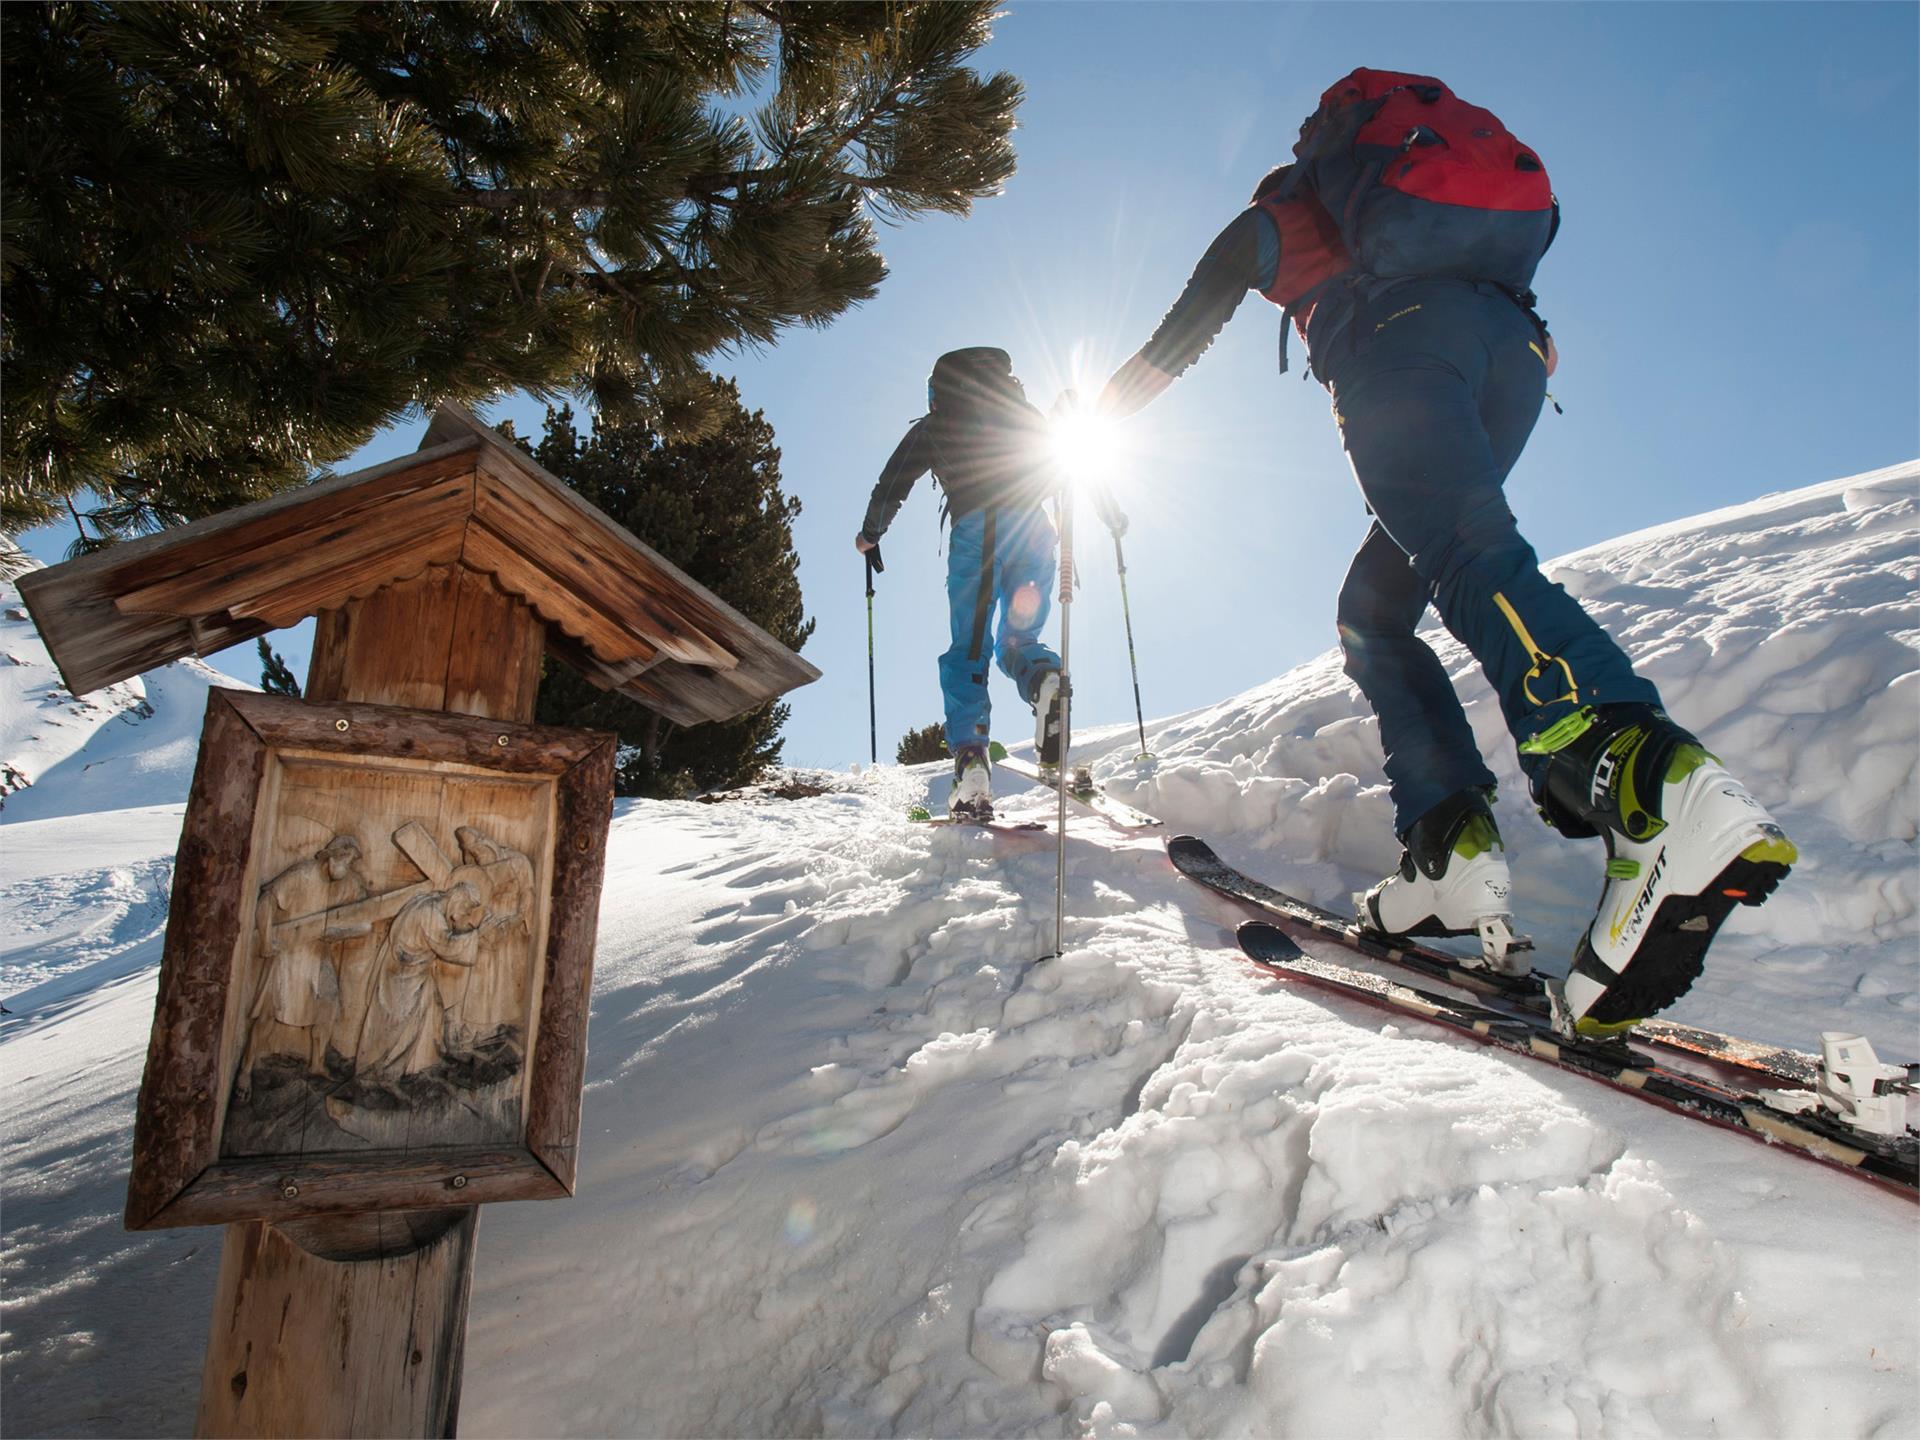 Skitour Juac – Regensburgerhütte – Col Raiser